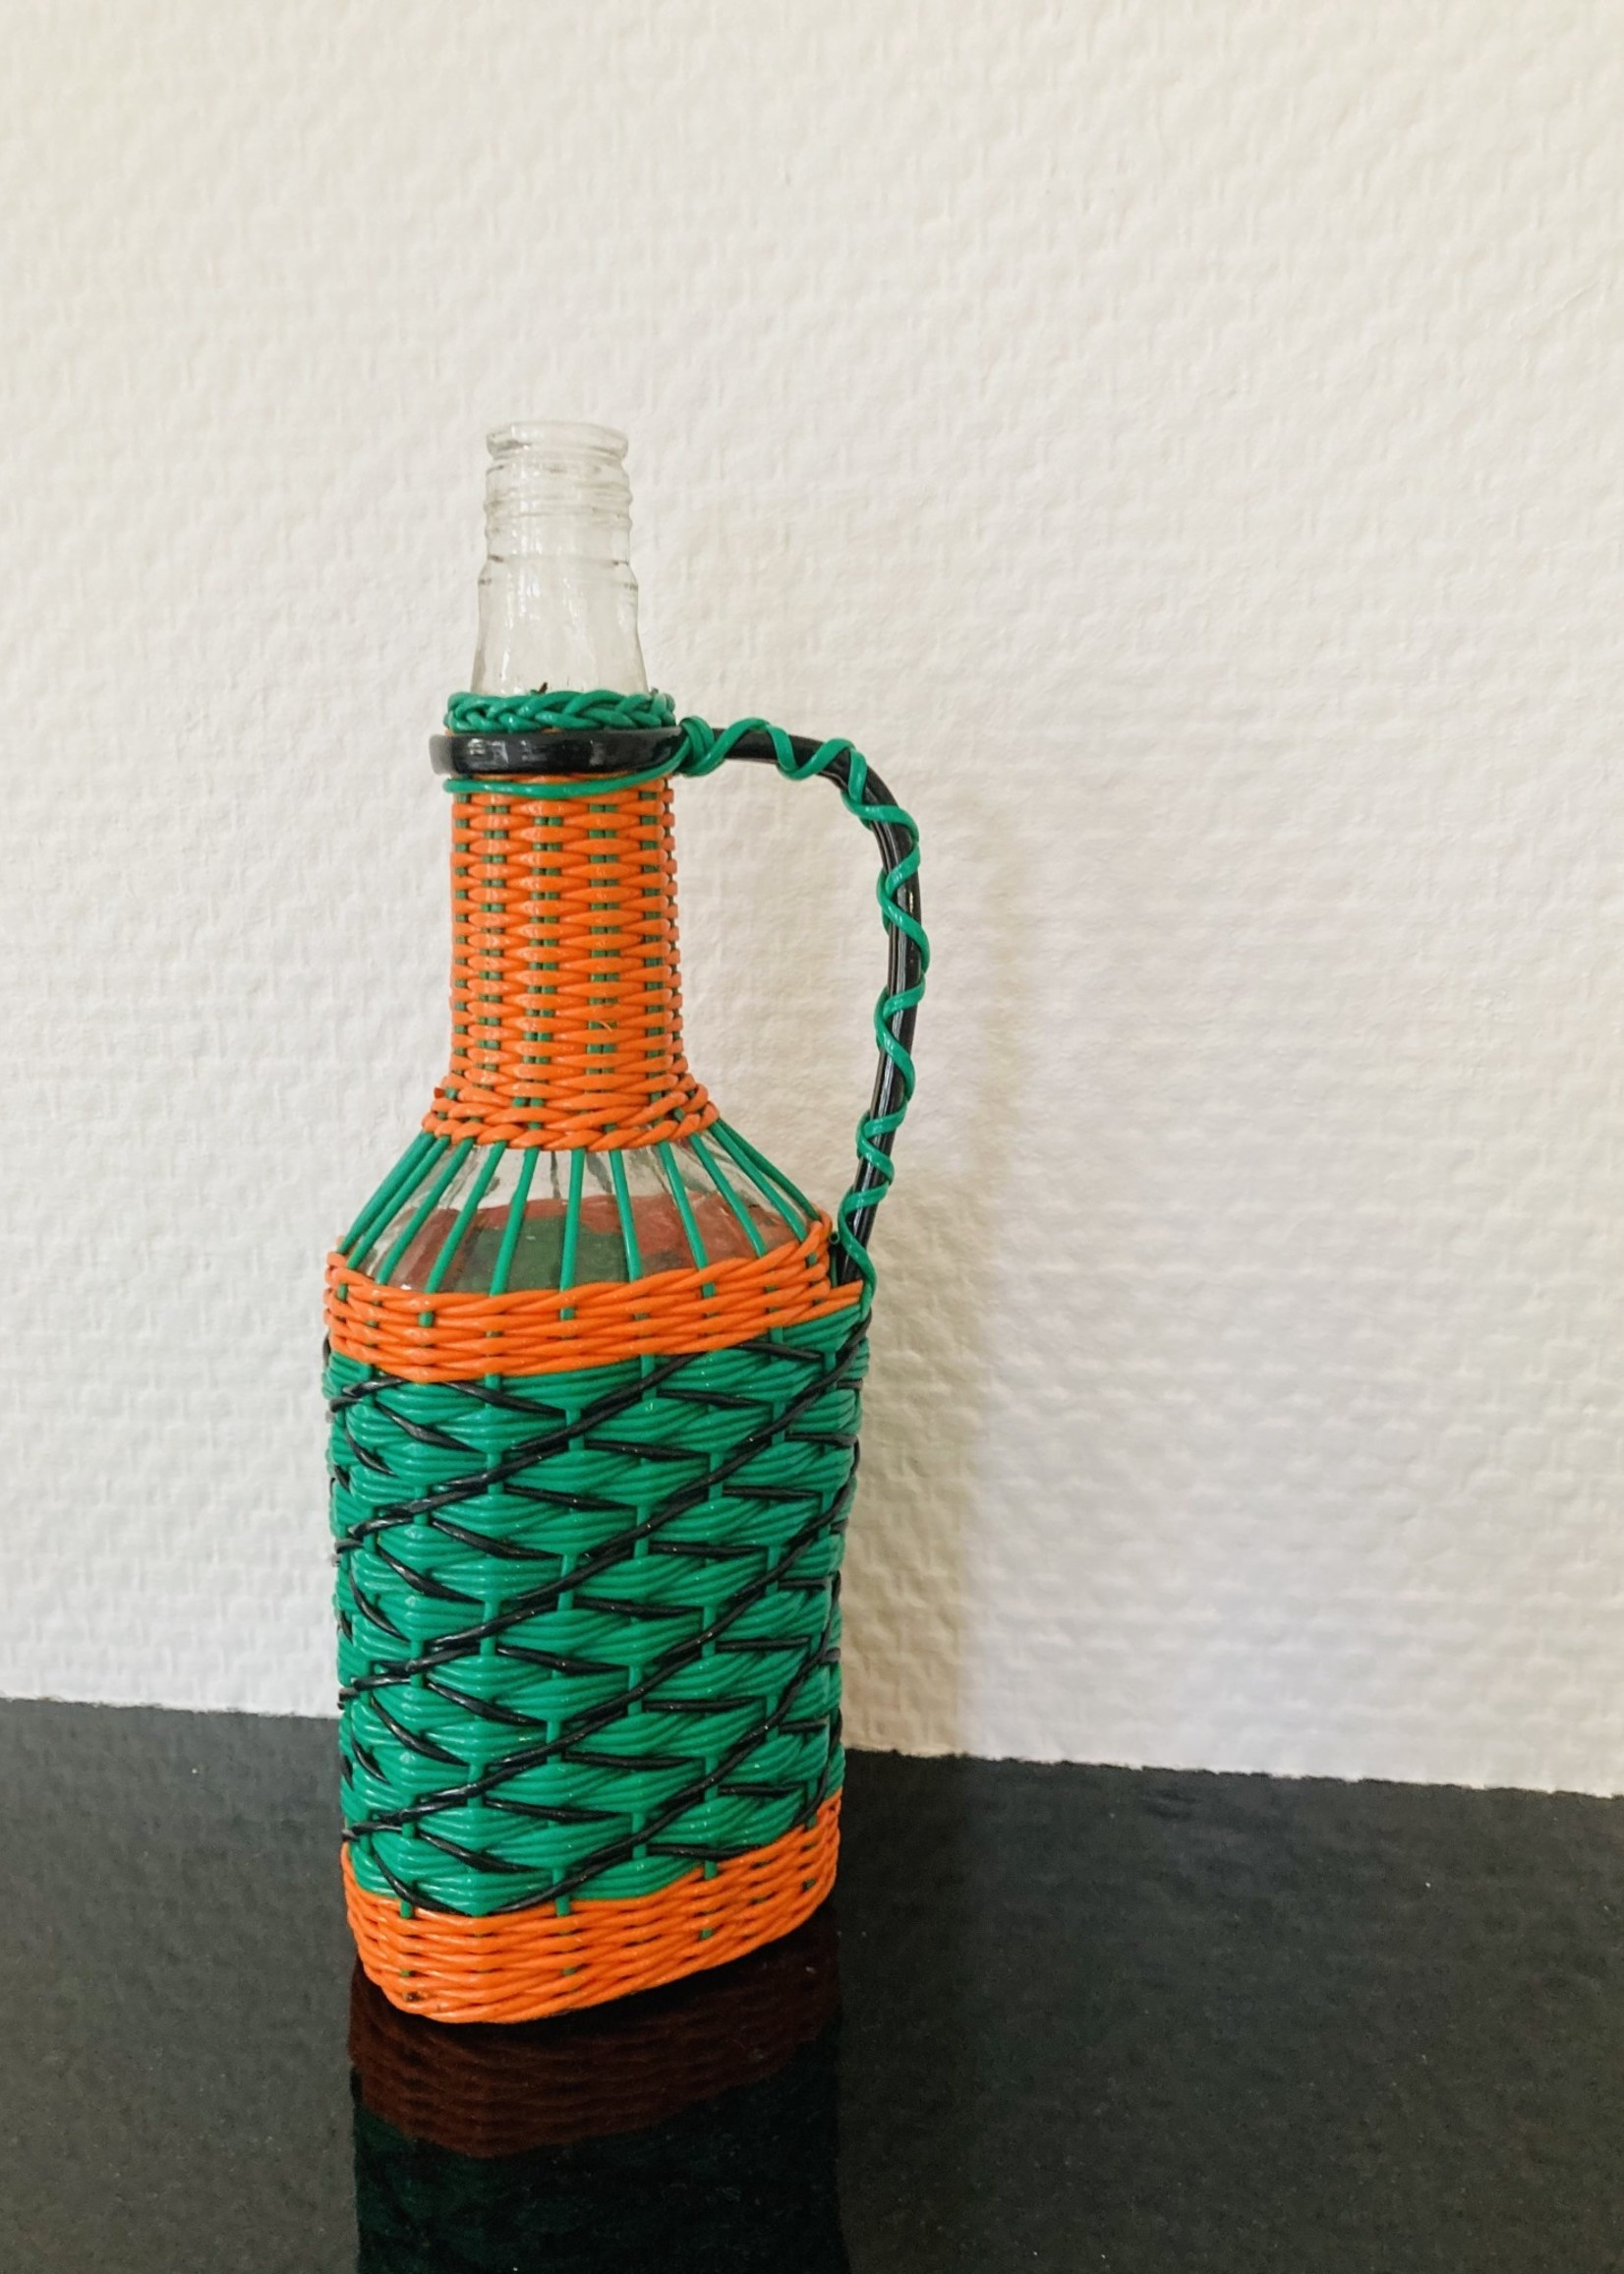 Seventies bottle with Scoobidoo decoration and